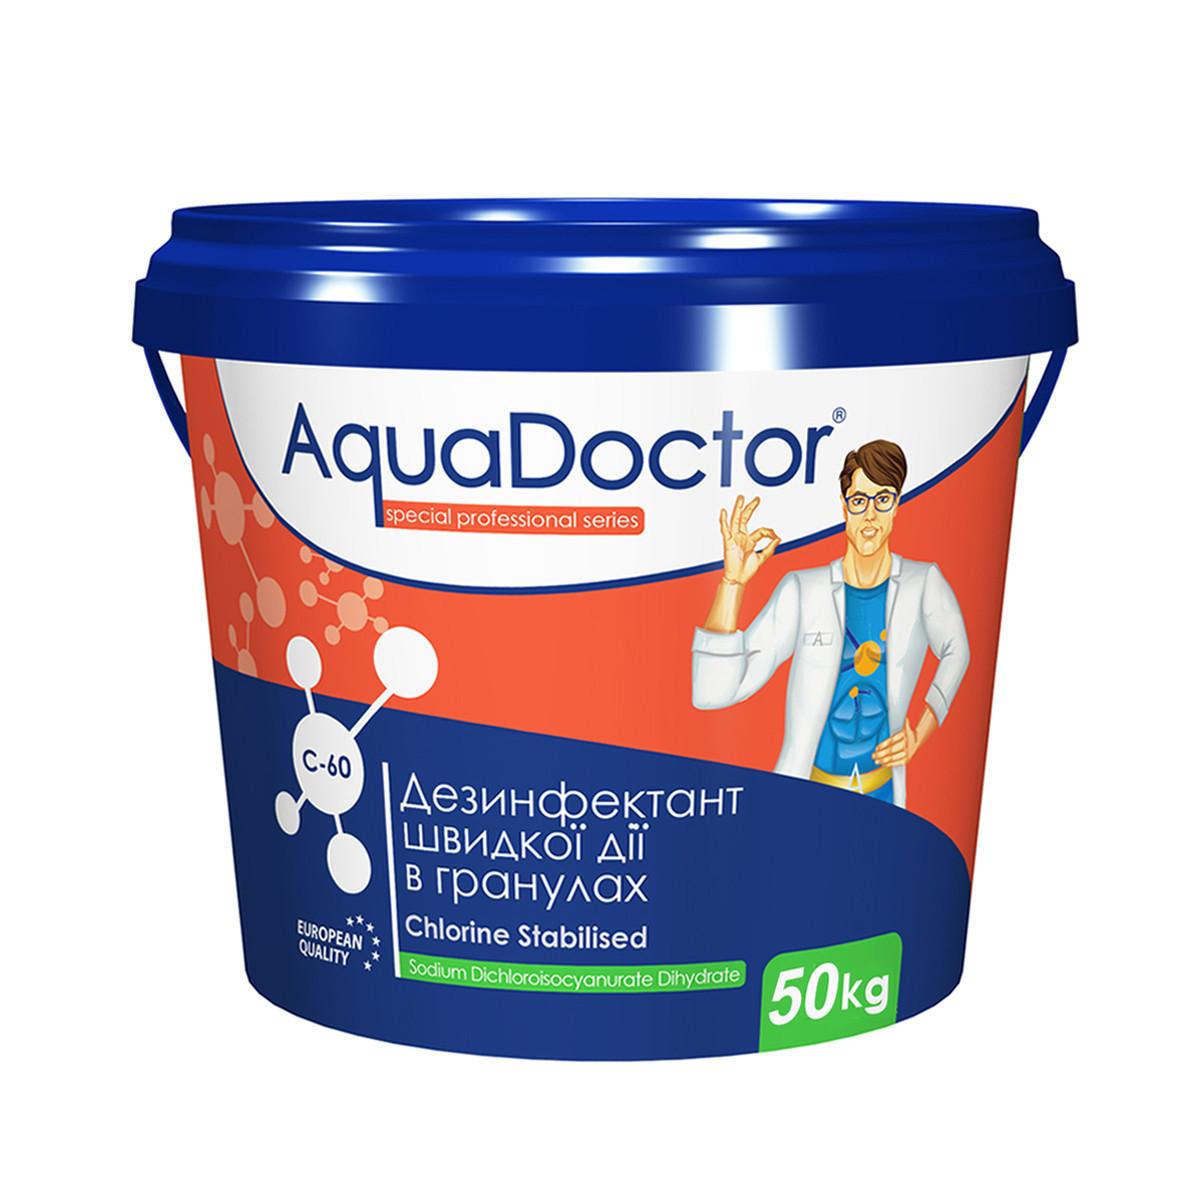 AquaDoctor C-60 (50 кг) ГРАНУЛЫ. Шок хлор, быстрый хлор. Химия для бассейнов